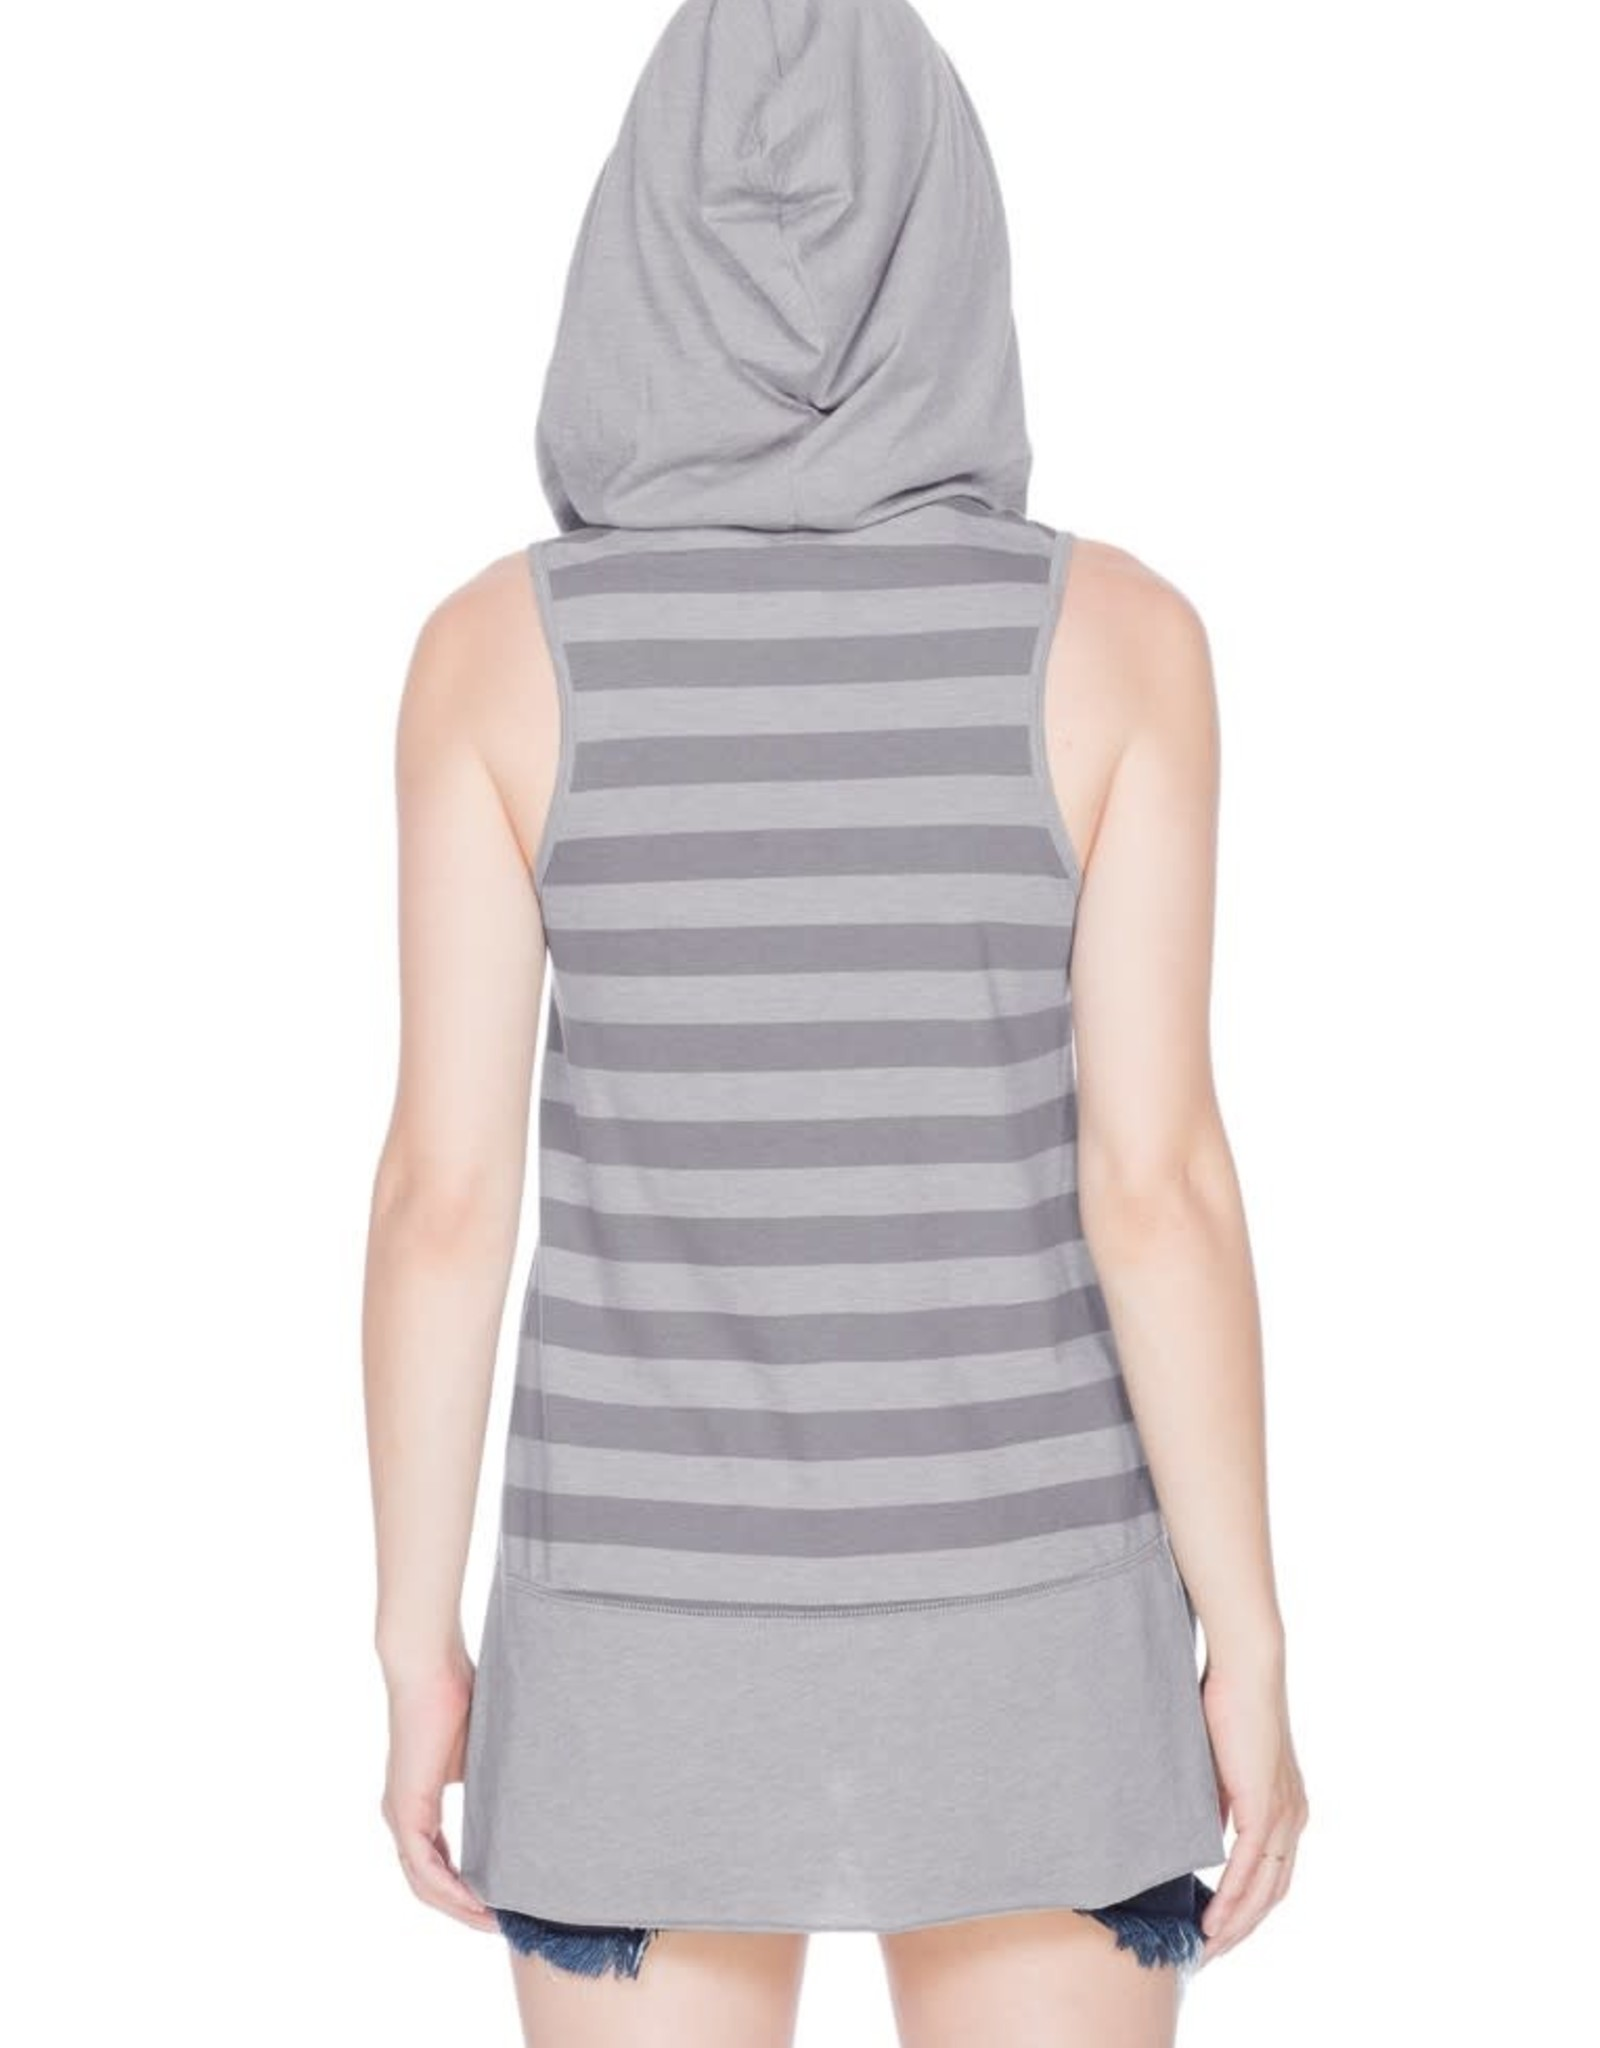 Kavio Juniors Jersey Striped Back Hoodie Tank